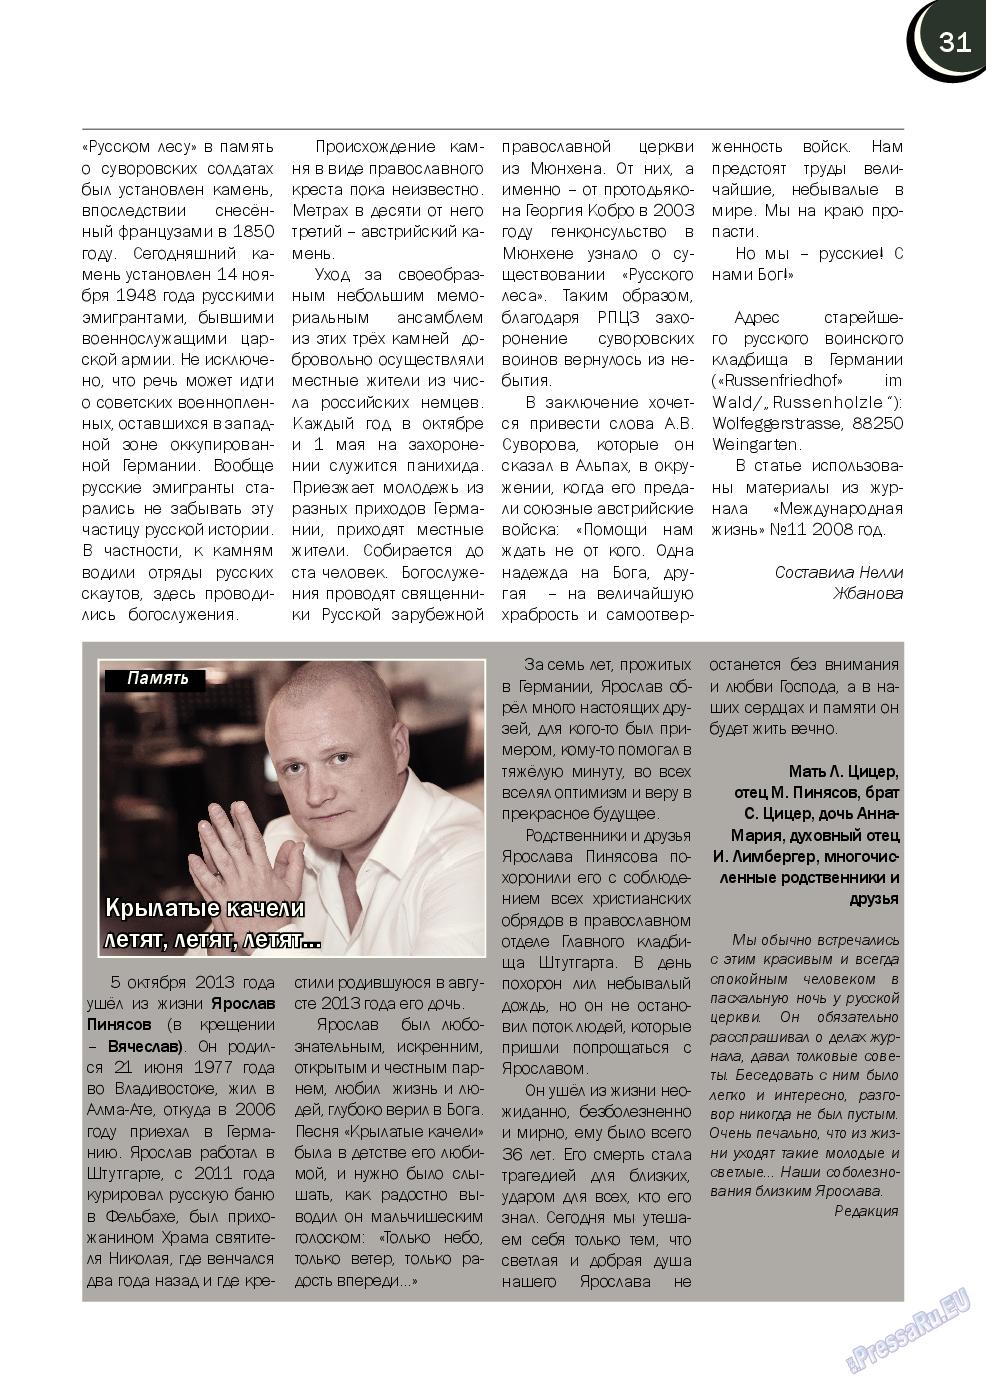 Русский Баден-Вюртемберг (журнал). 2014 год, номер 43, стр. 31